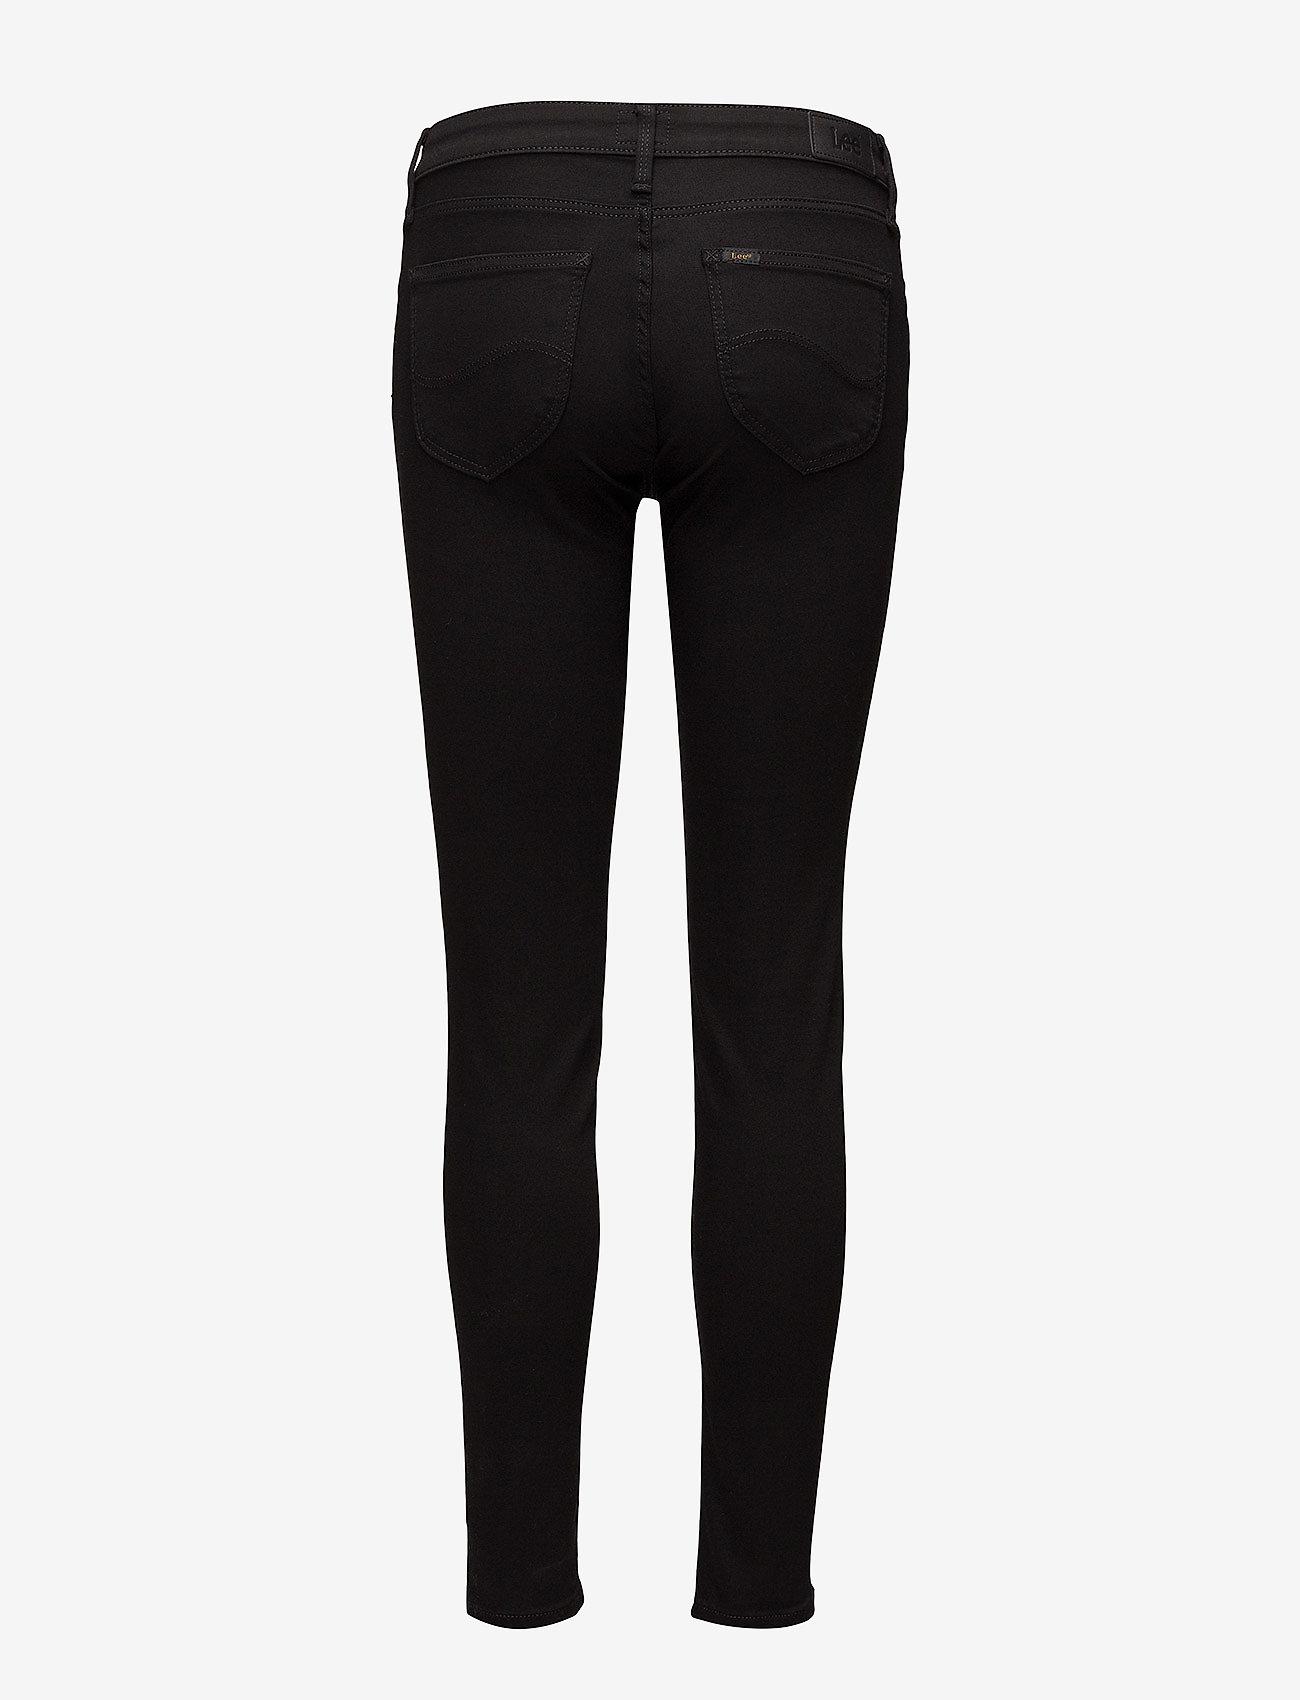 Lee Jeans - SCARLETT - skinny jeans - black rinse - 2